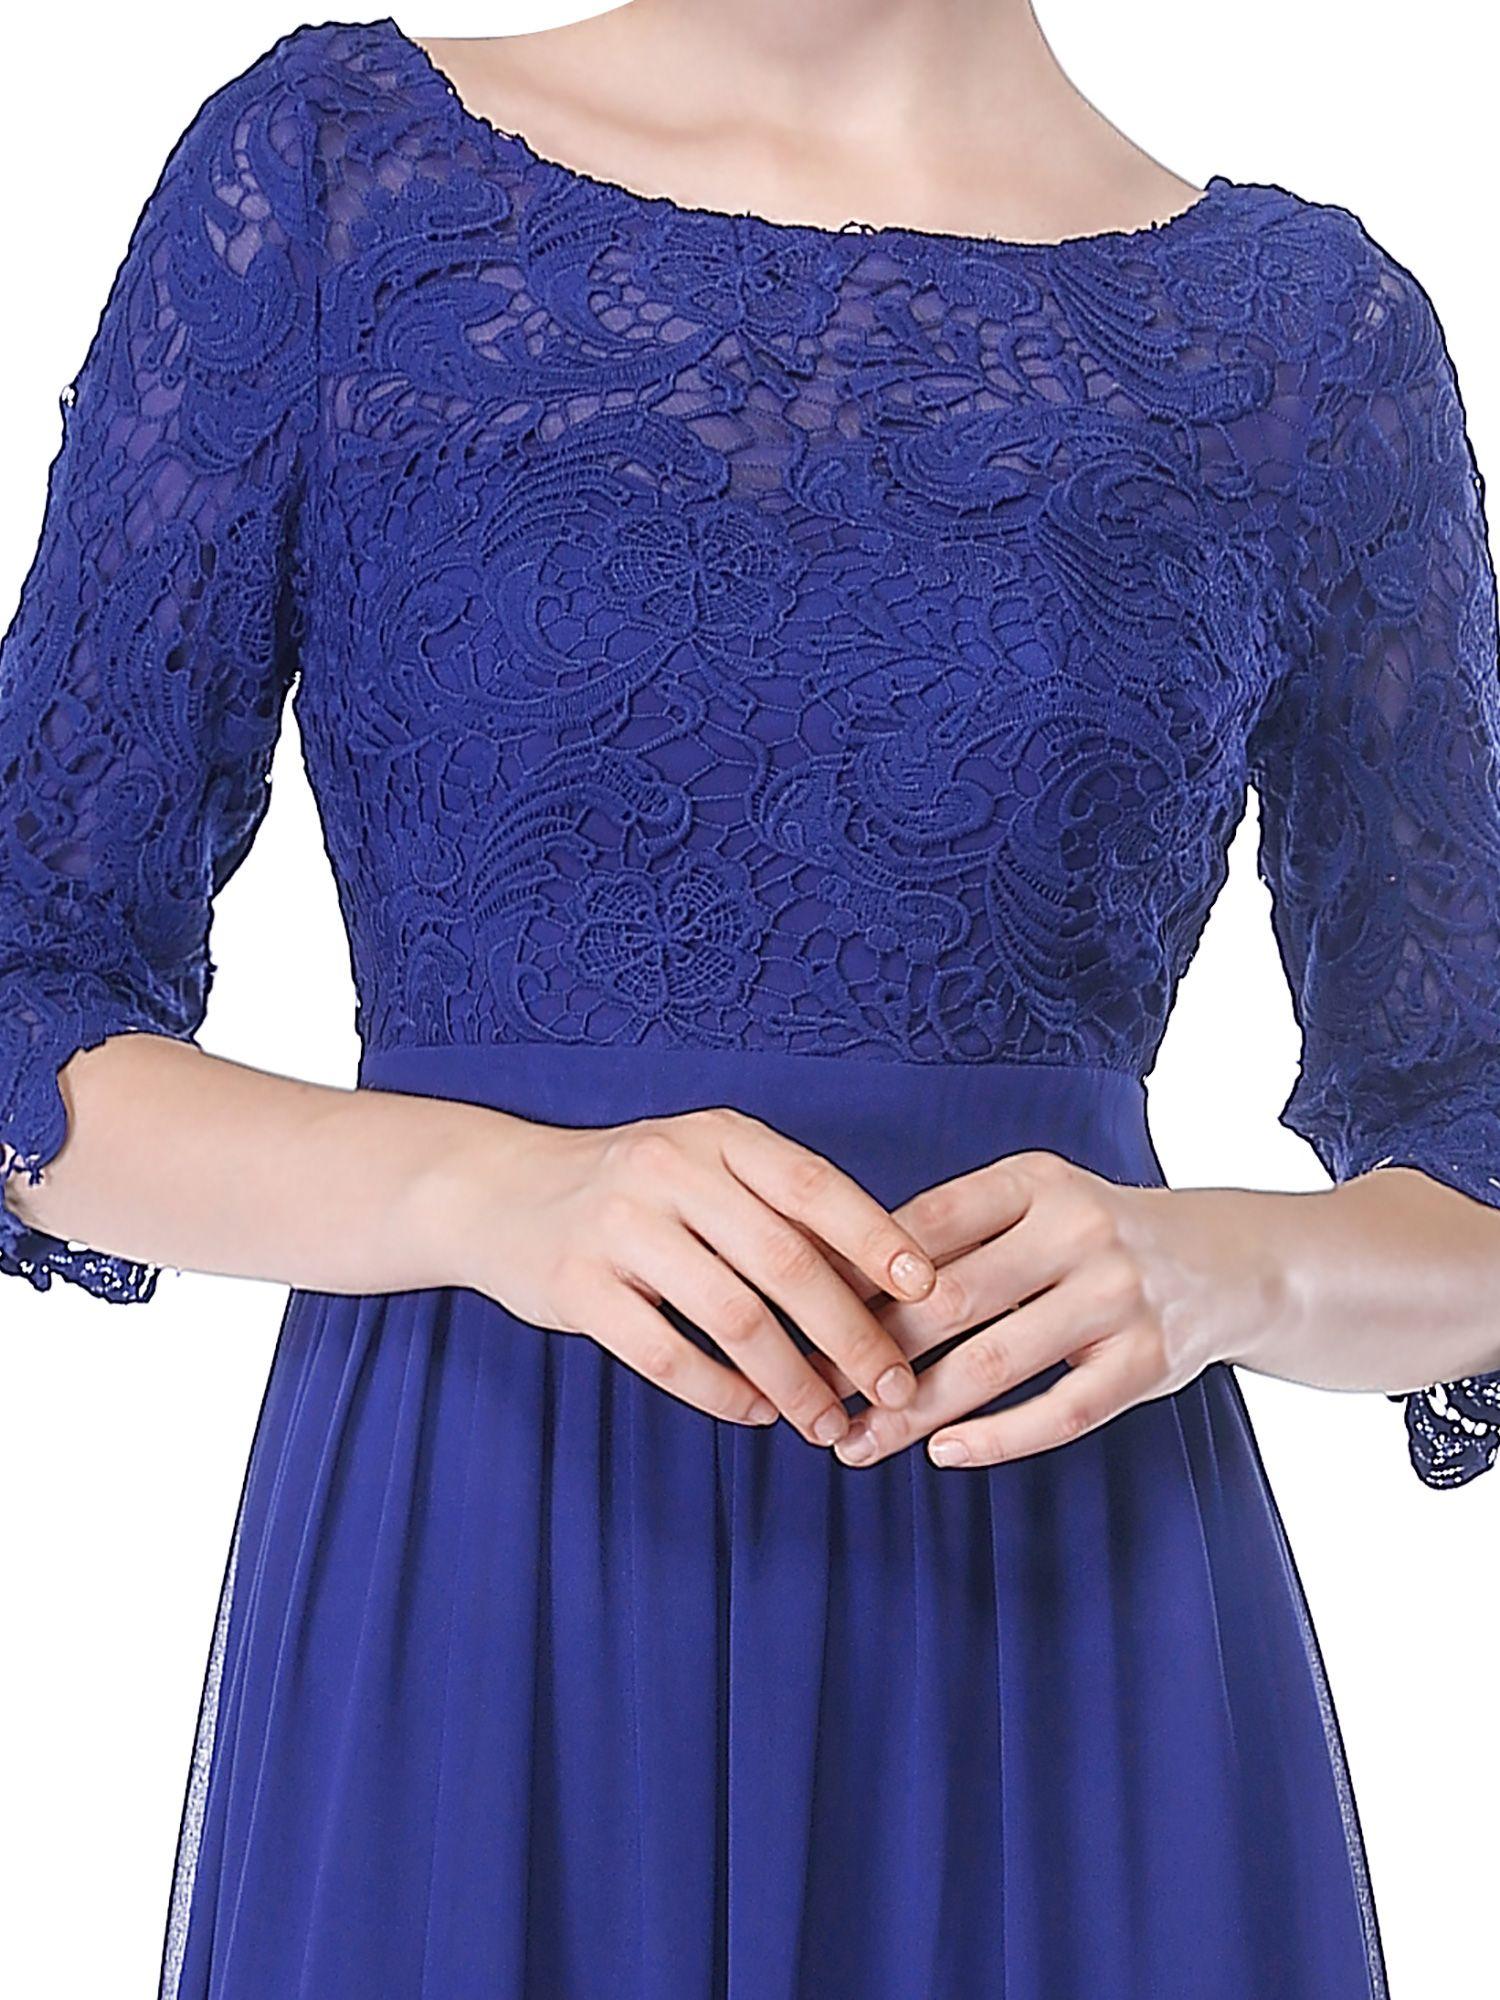 cd38eccb36b68 Ever-Pretty Women's Elegant Long Formal Evening Party Dresses with 3 ...